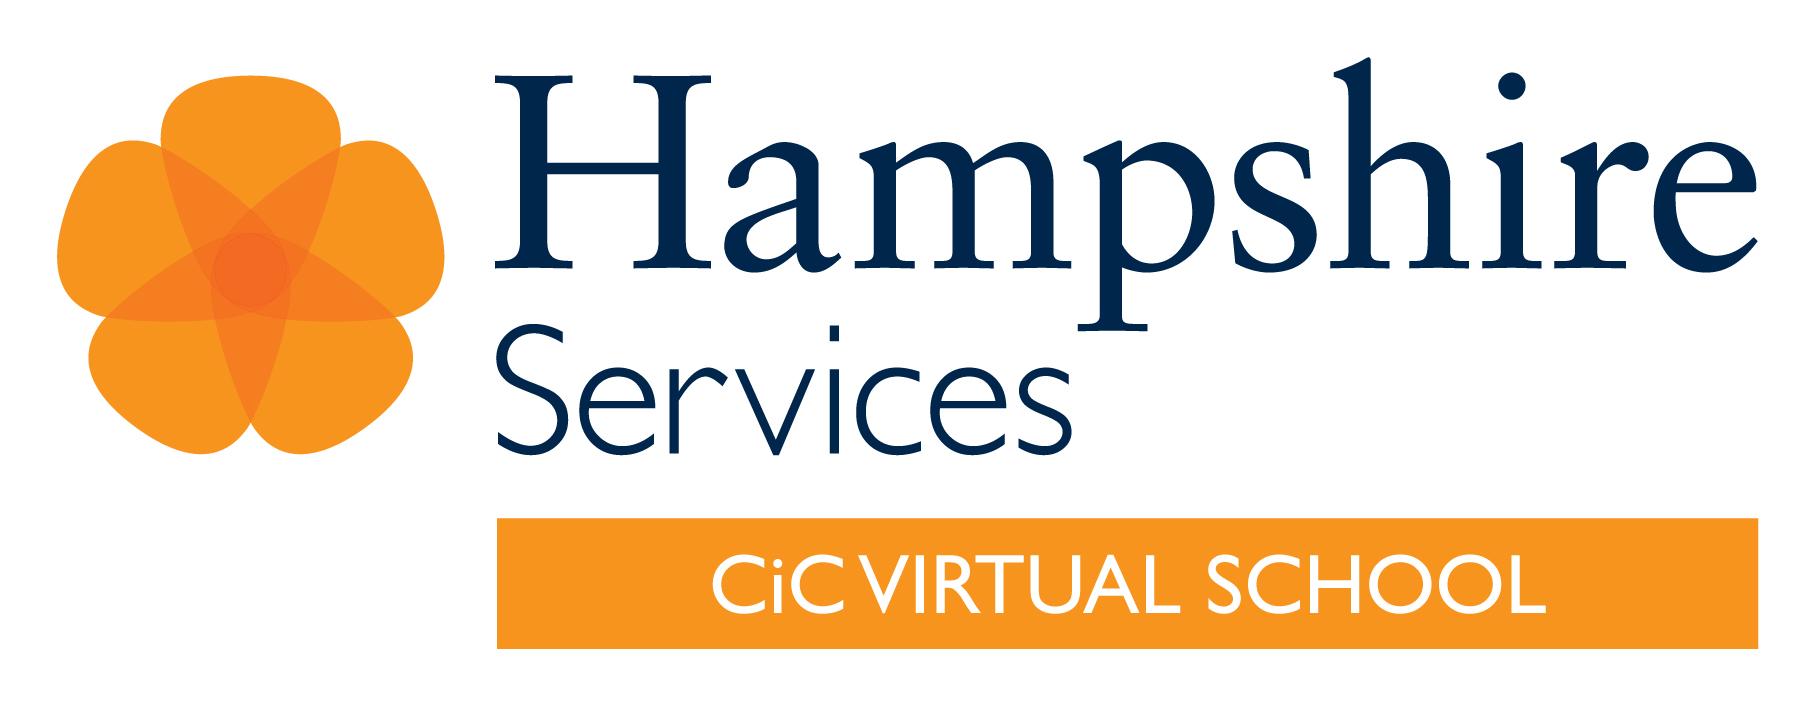 Hampshire Virtual School and College